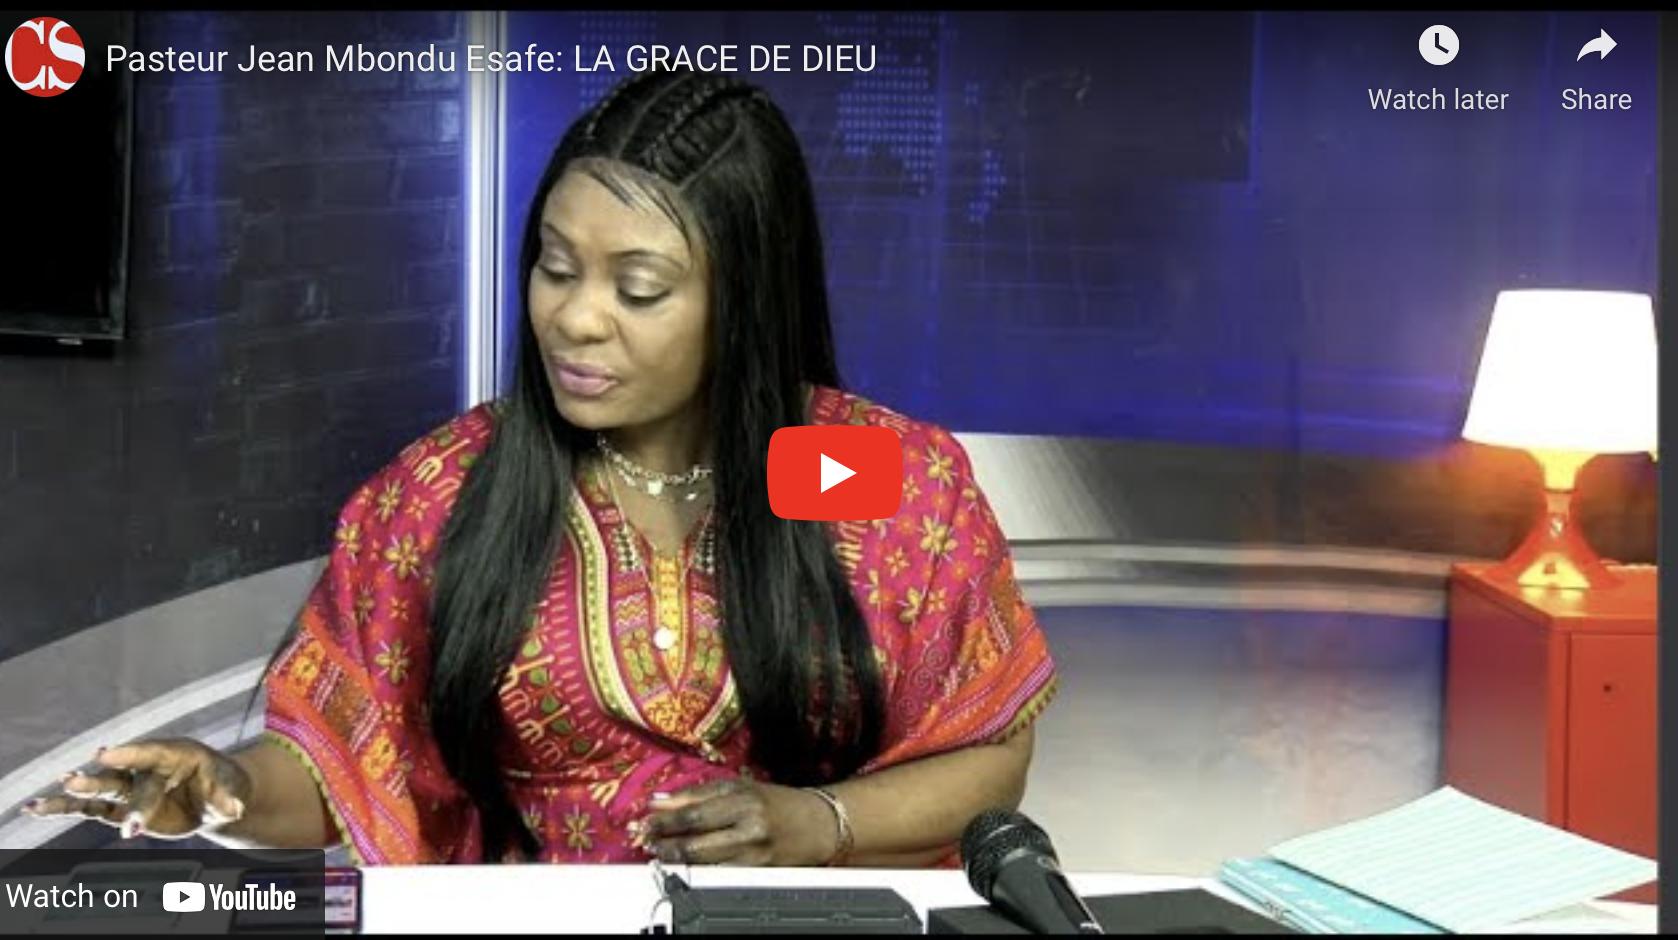 Pasteur Jean Mbondu Esafe: LA GRACE DE DIEU.